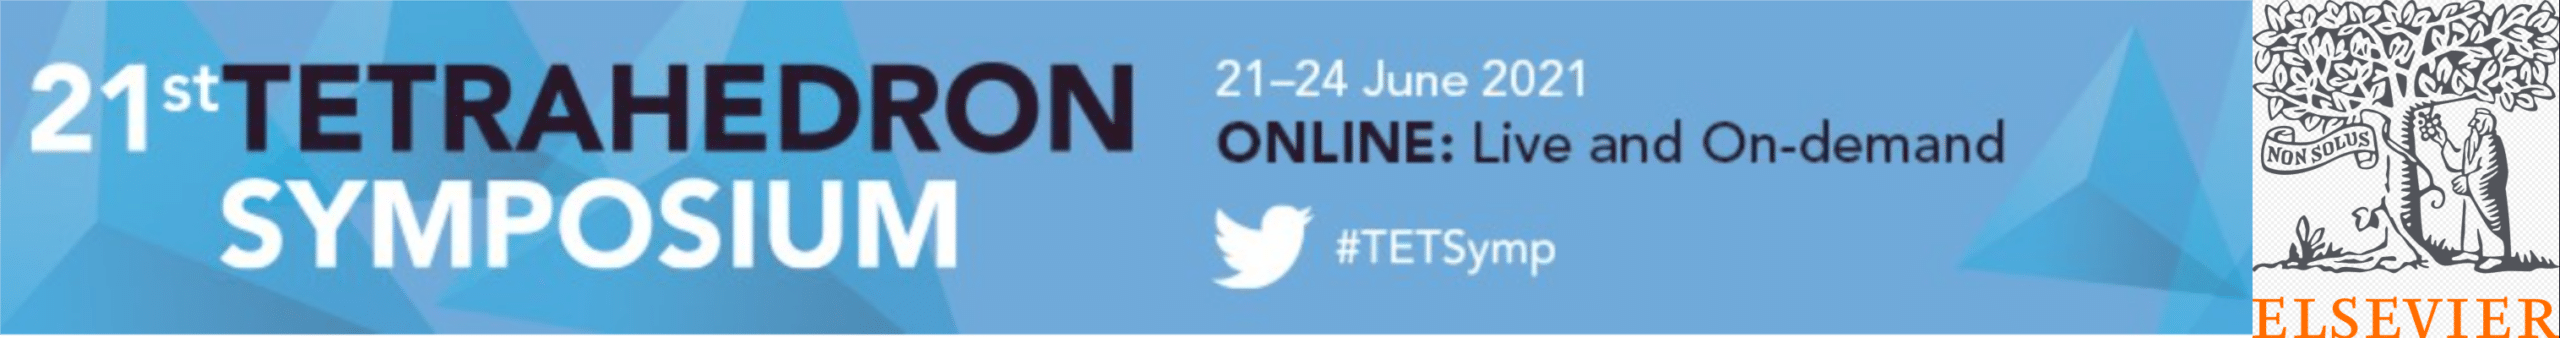 Magritek will be exhibiting at the 21st Tetrahedron Symposium 2021